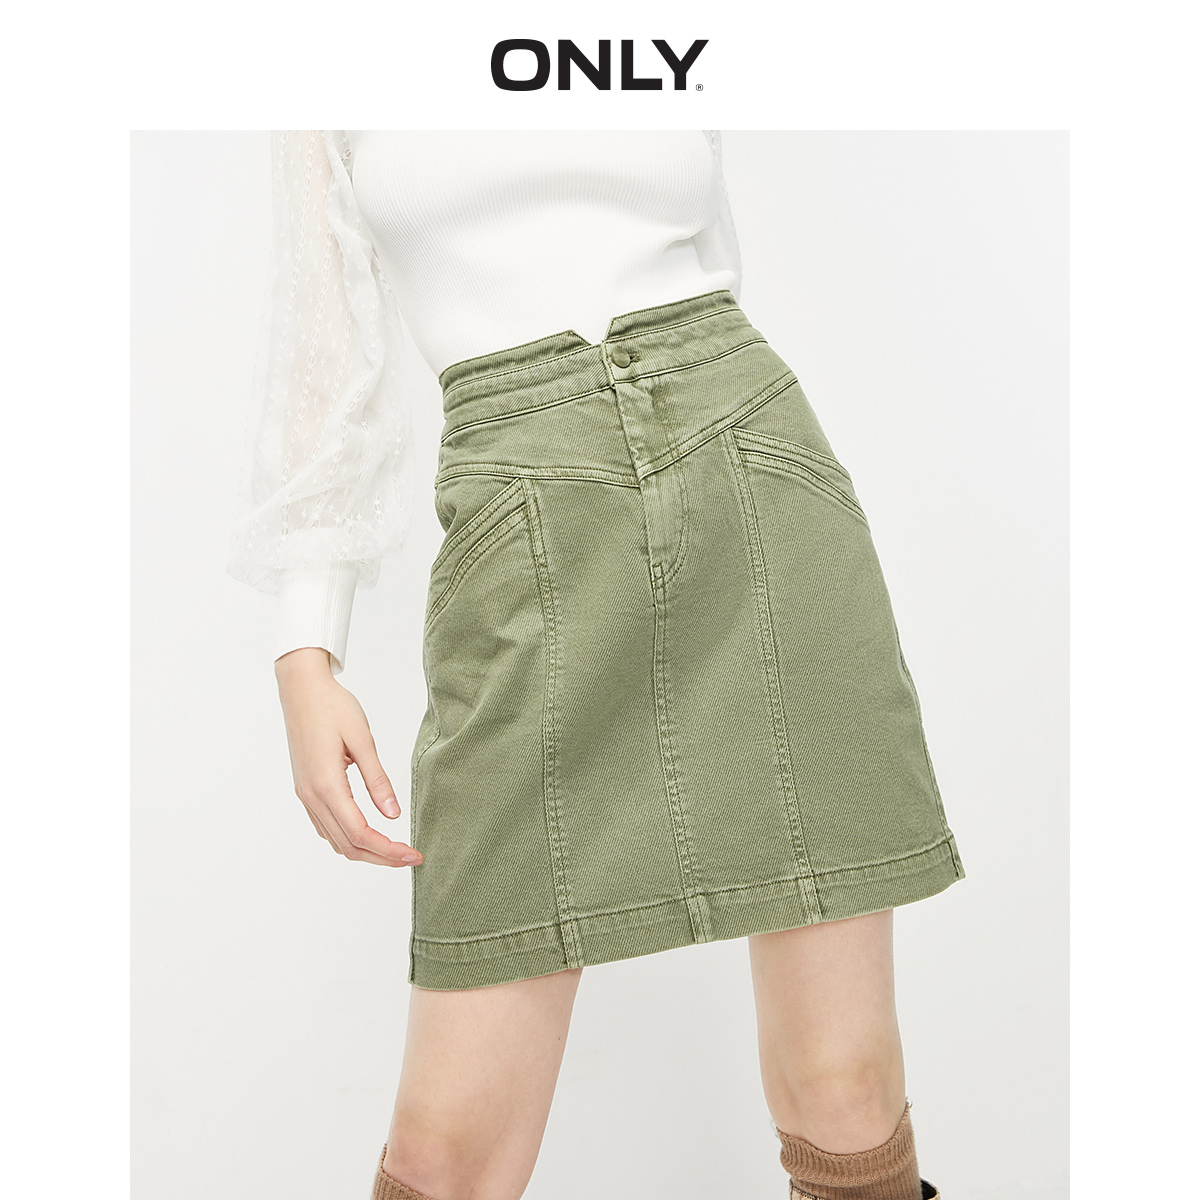 ONLY2020夏季高腰直筒工装风压线短款半身裙女|120116501